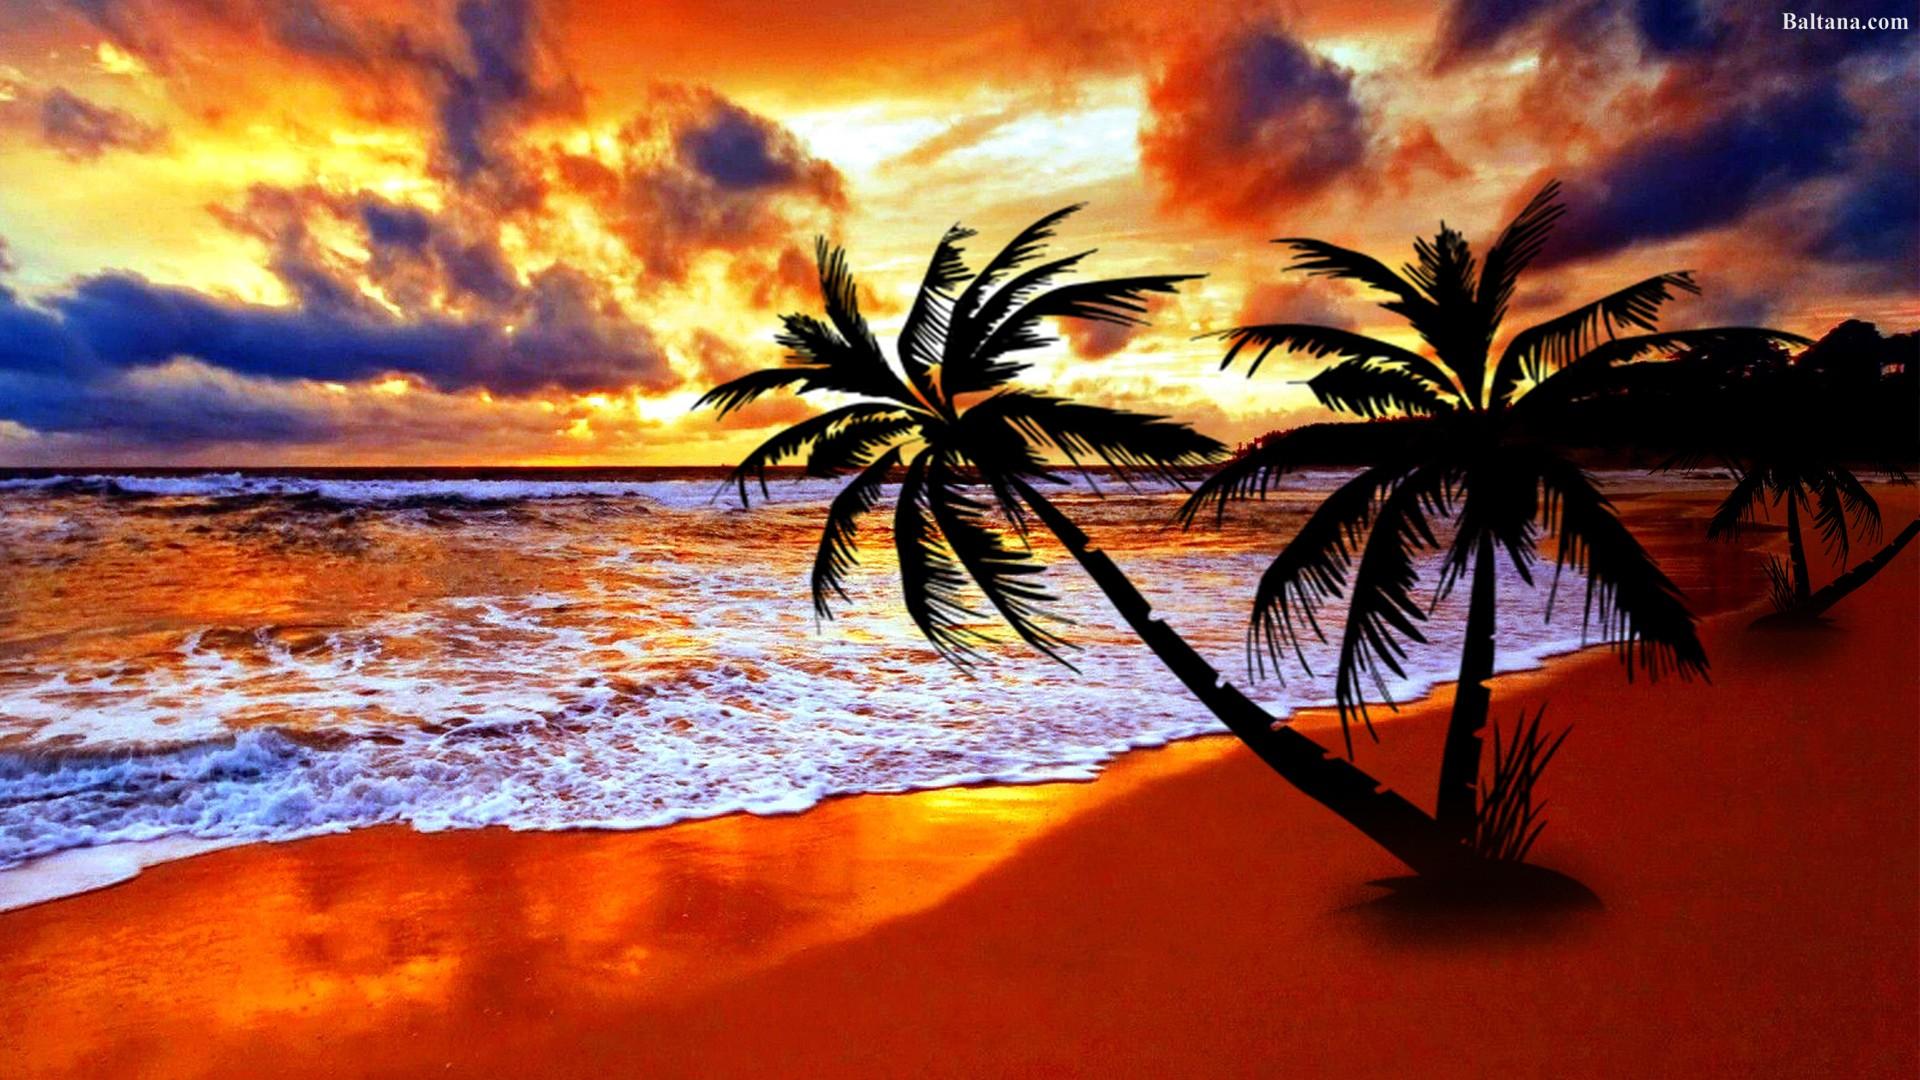 palm tree wallpaper,sky,nature,tropics,sunset,tree